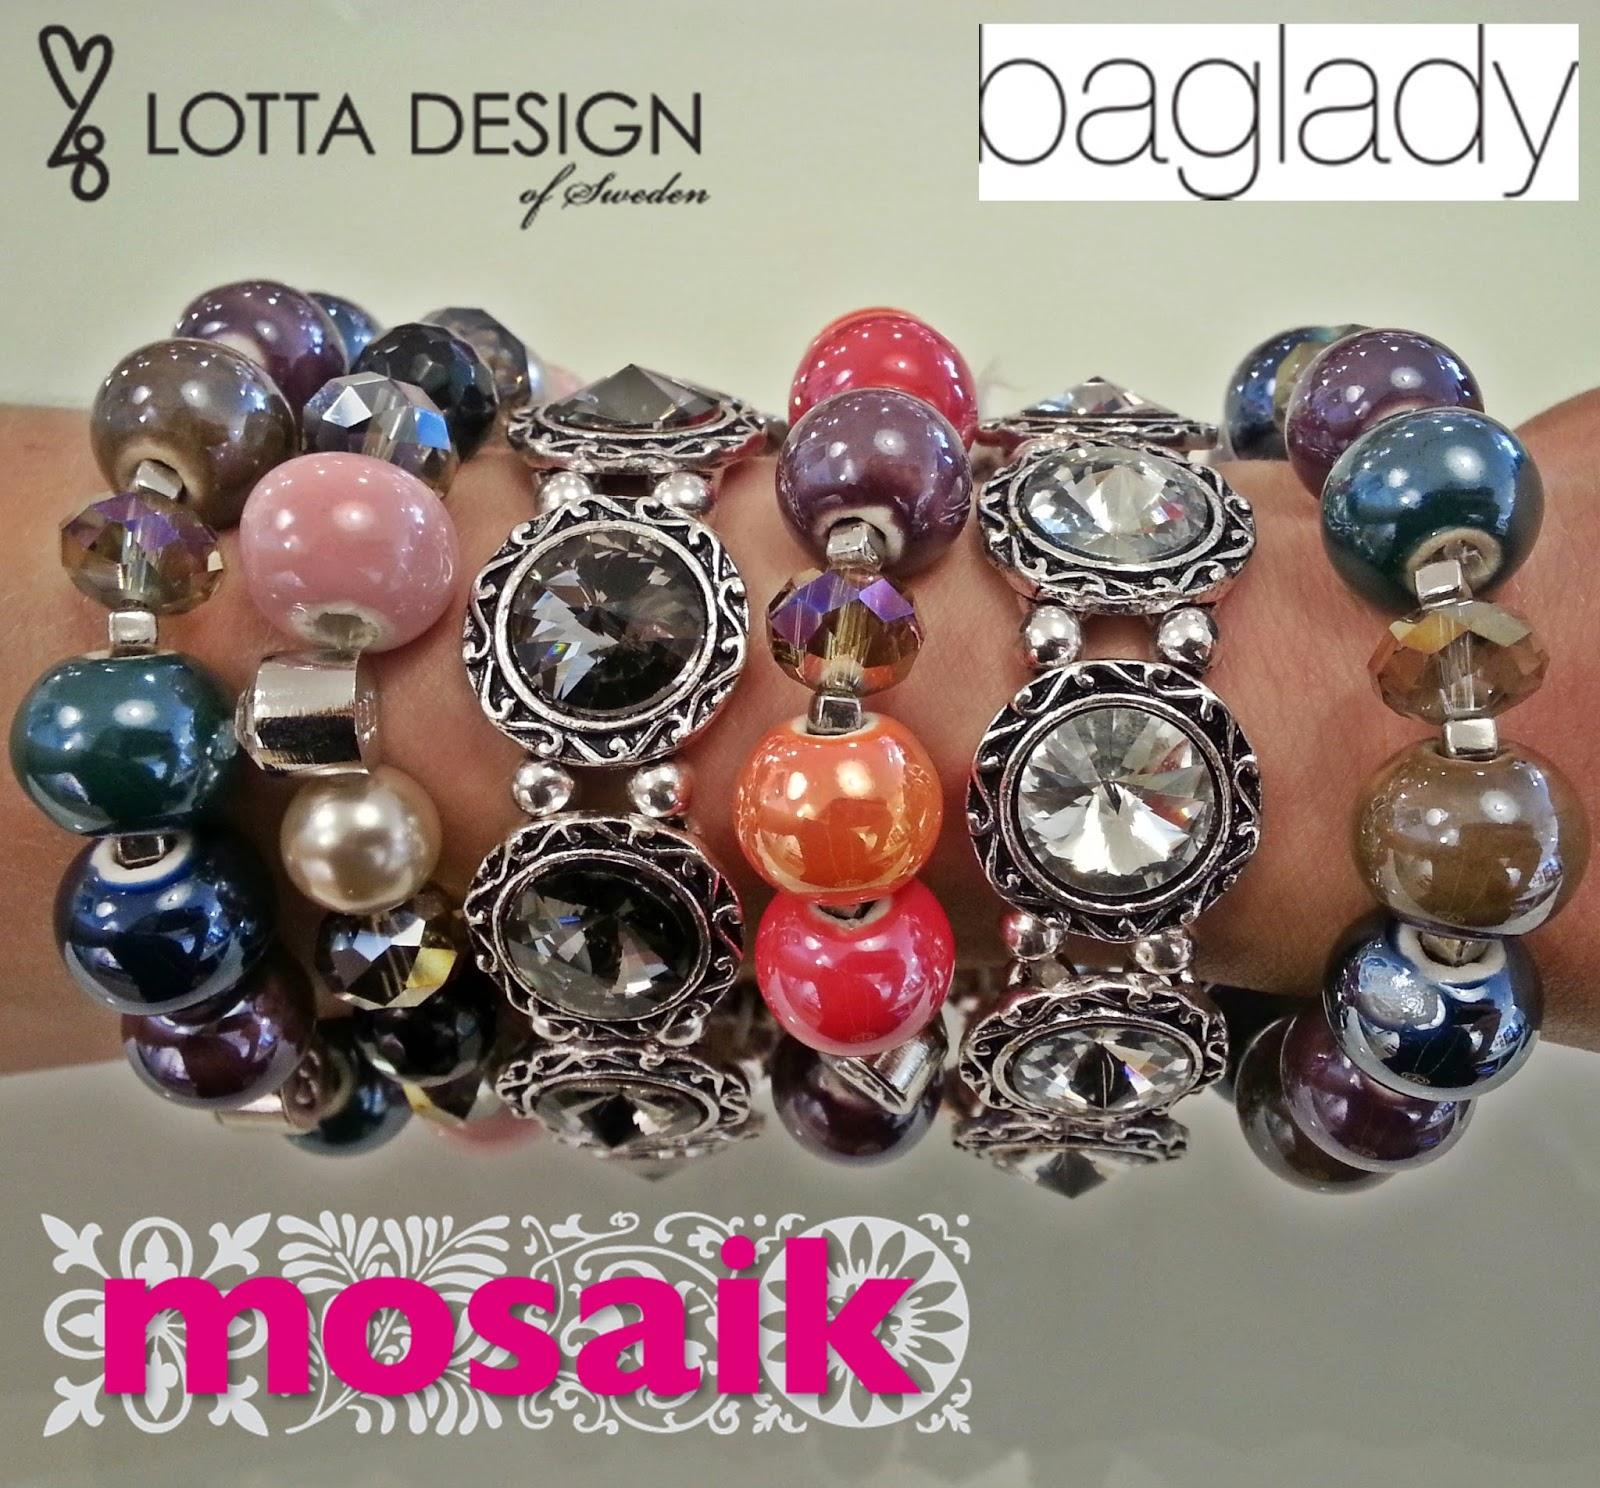 mosaik – mode • interiör: nya armband från lotta design & baglady